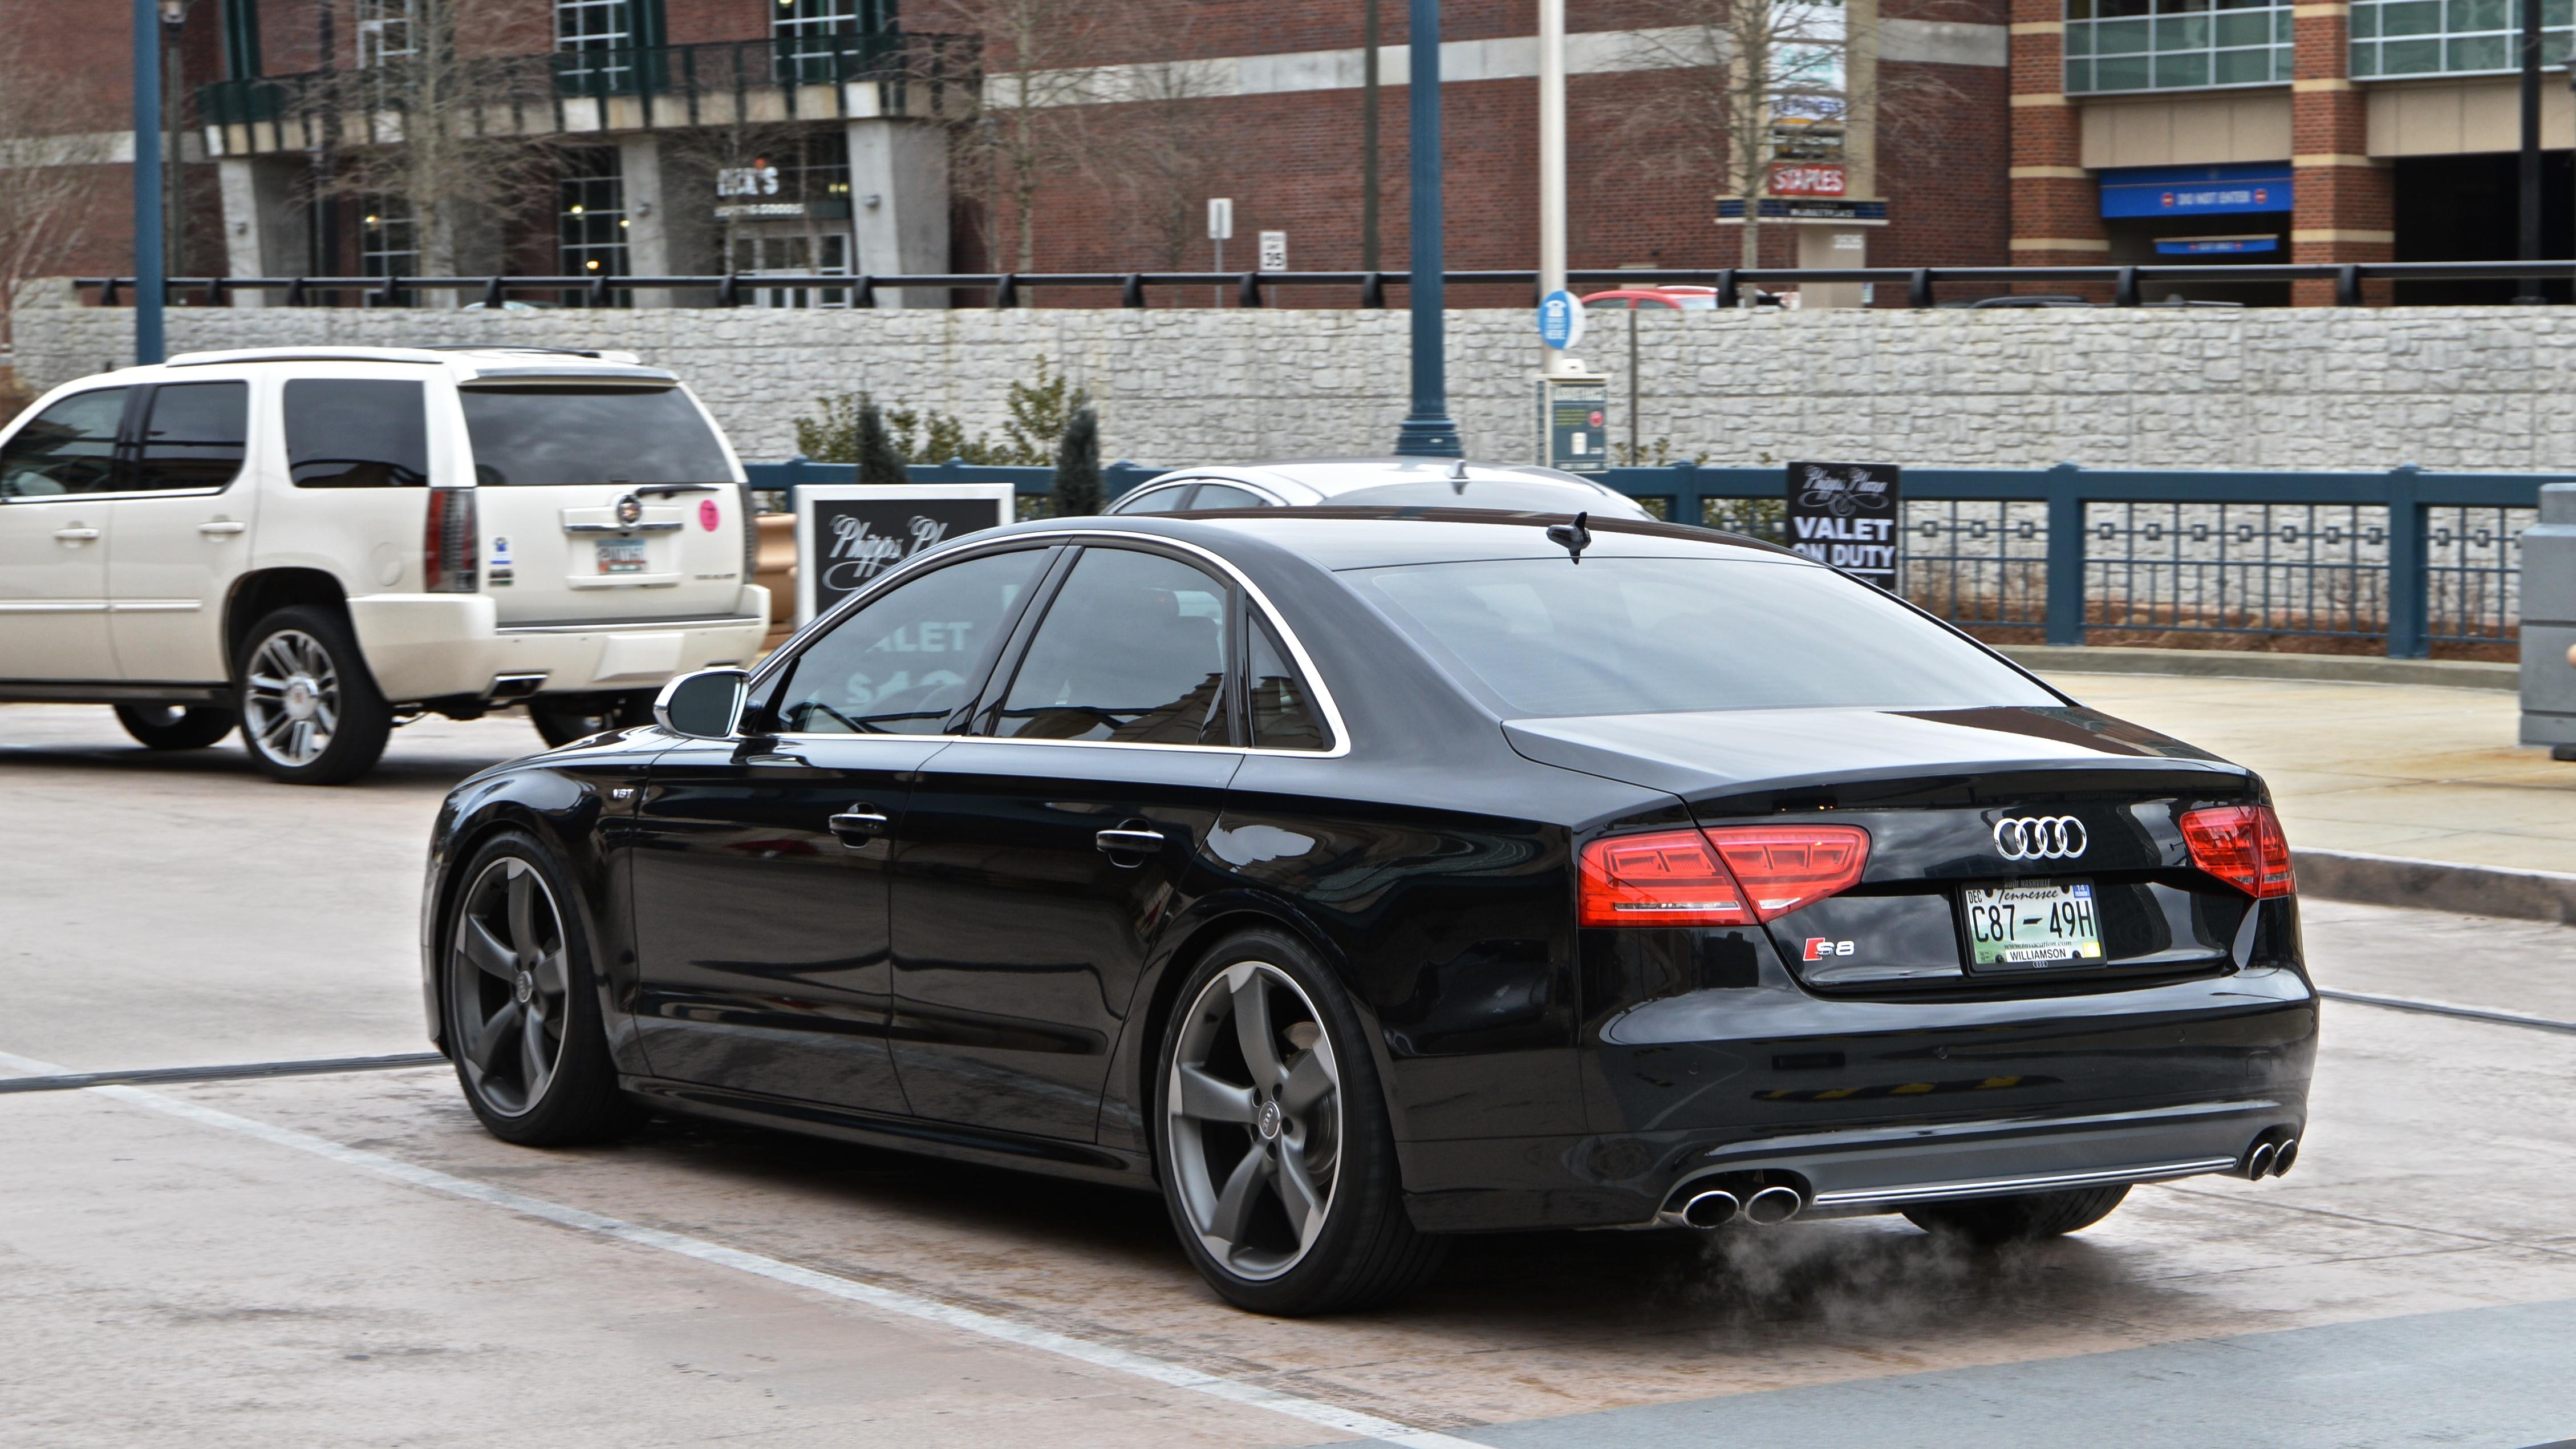 S8 car - Color: Black  // Description: elegant